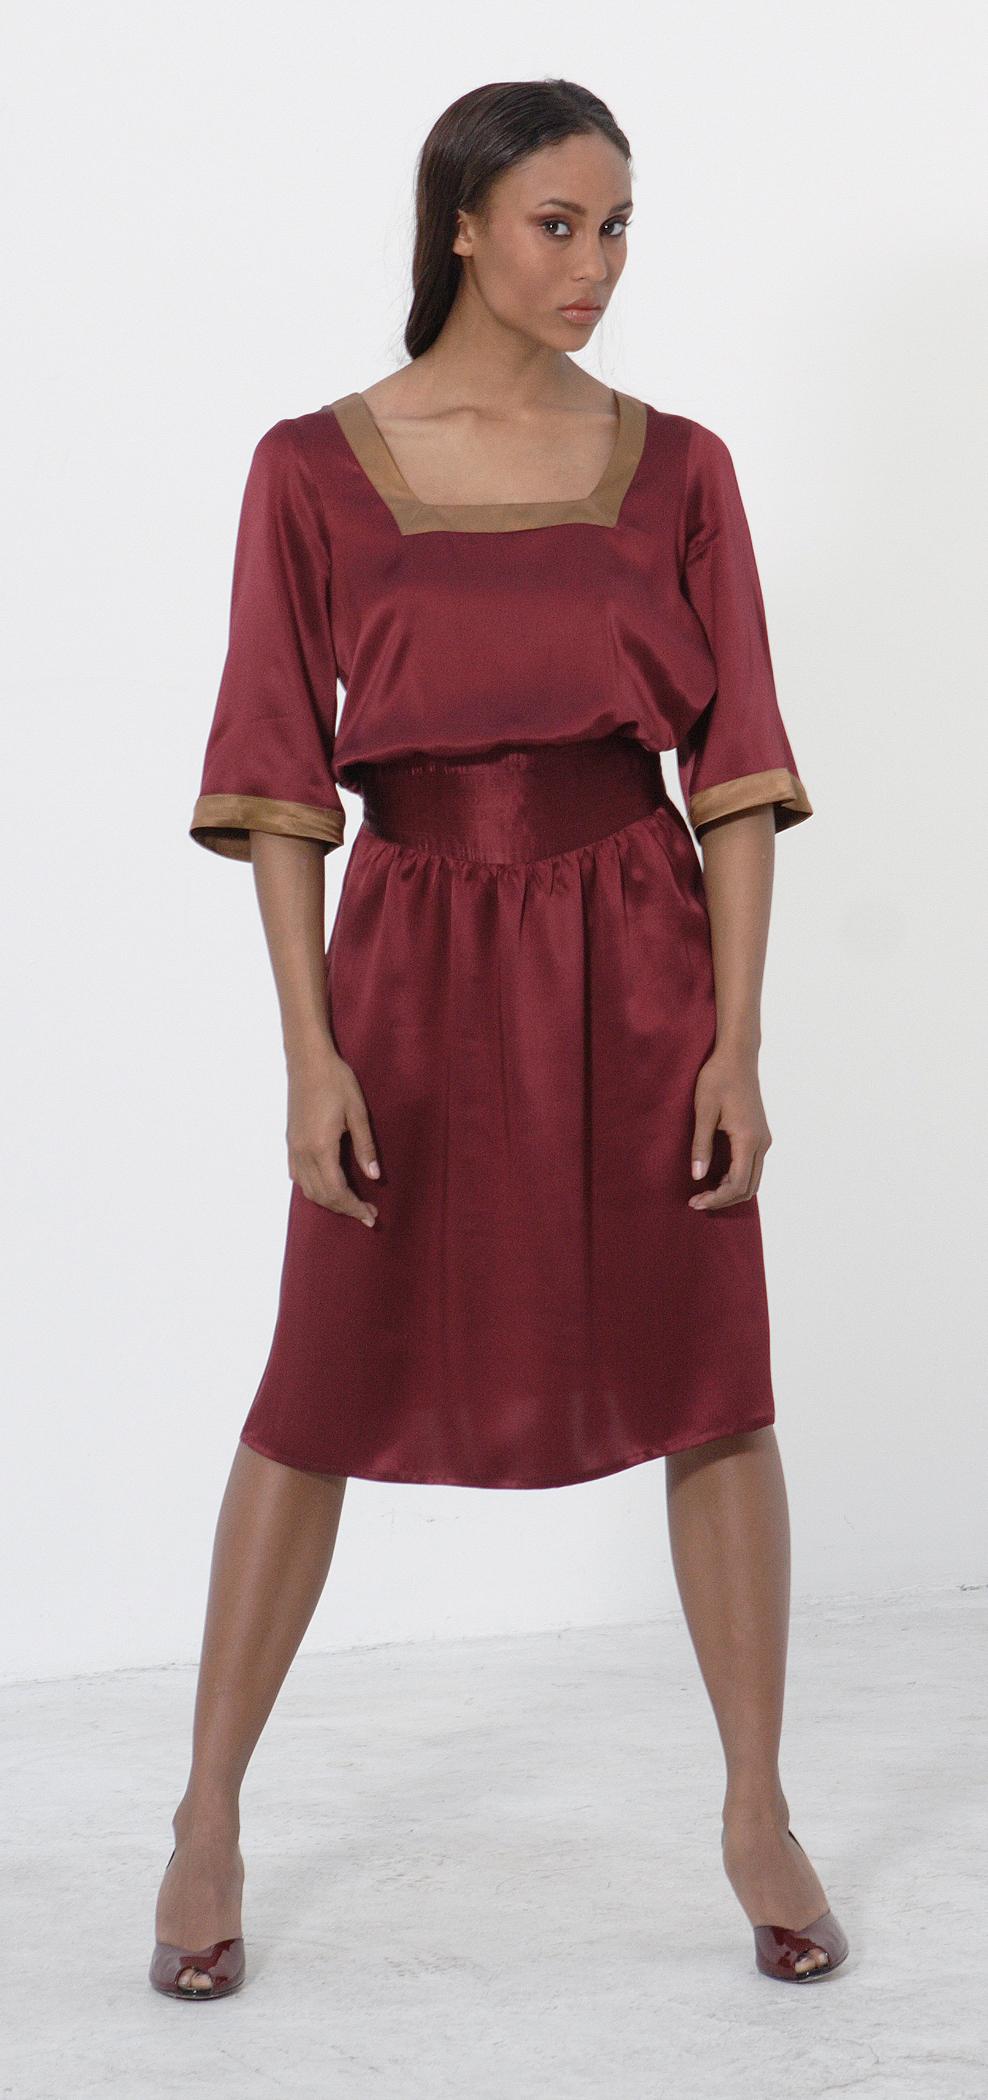 Silk Charmeuse Square Cut Dress w/ Quilt Stitch Waist.